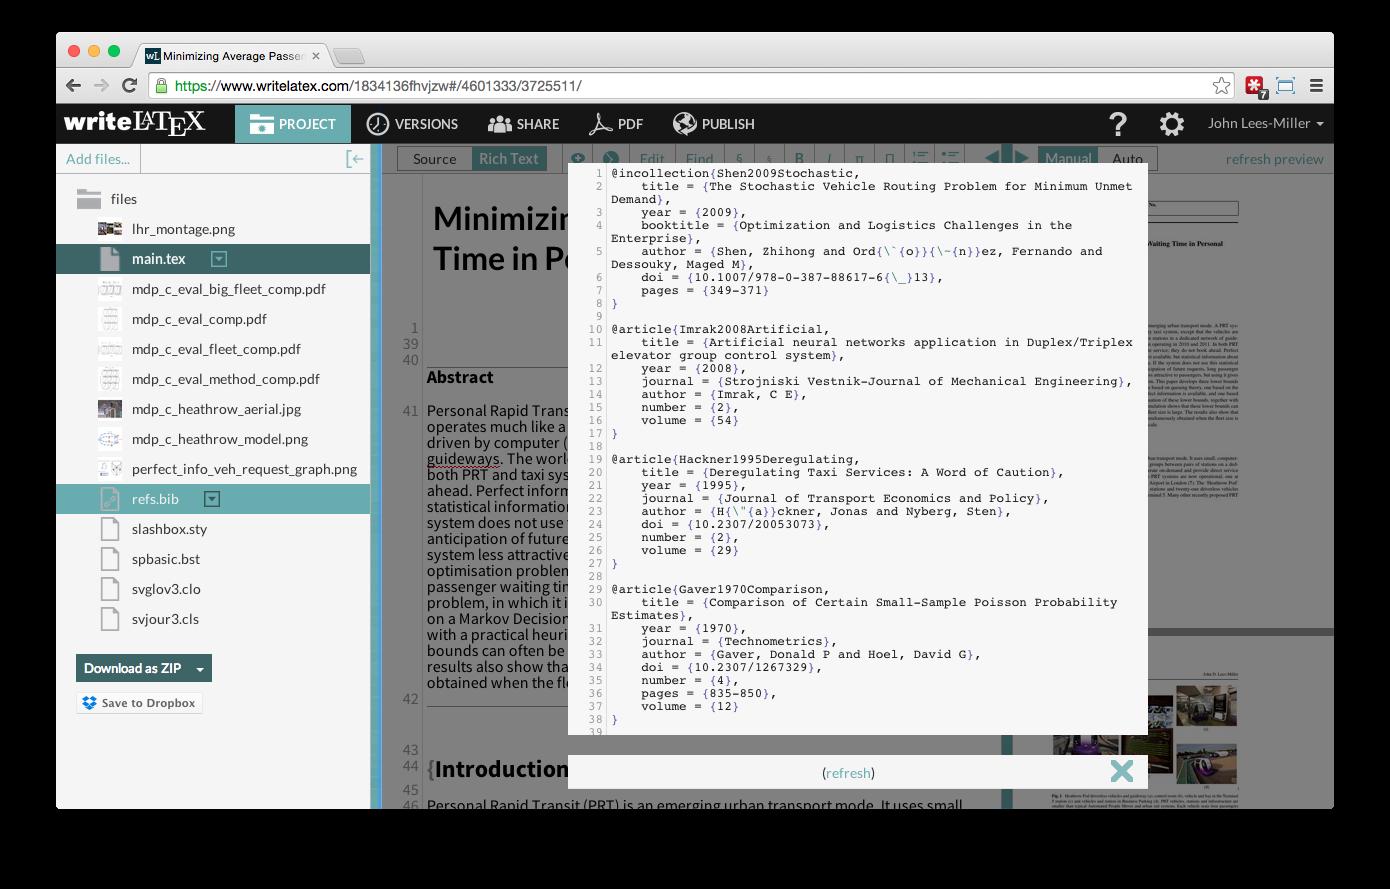 Overleaf Writelatex Mendeley reference bibliography import screenshot 6